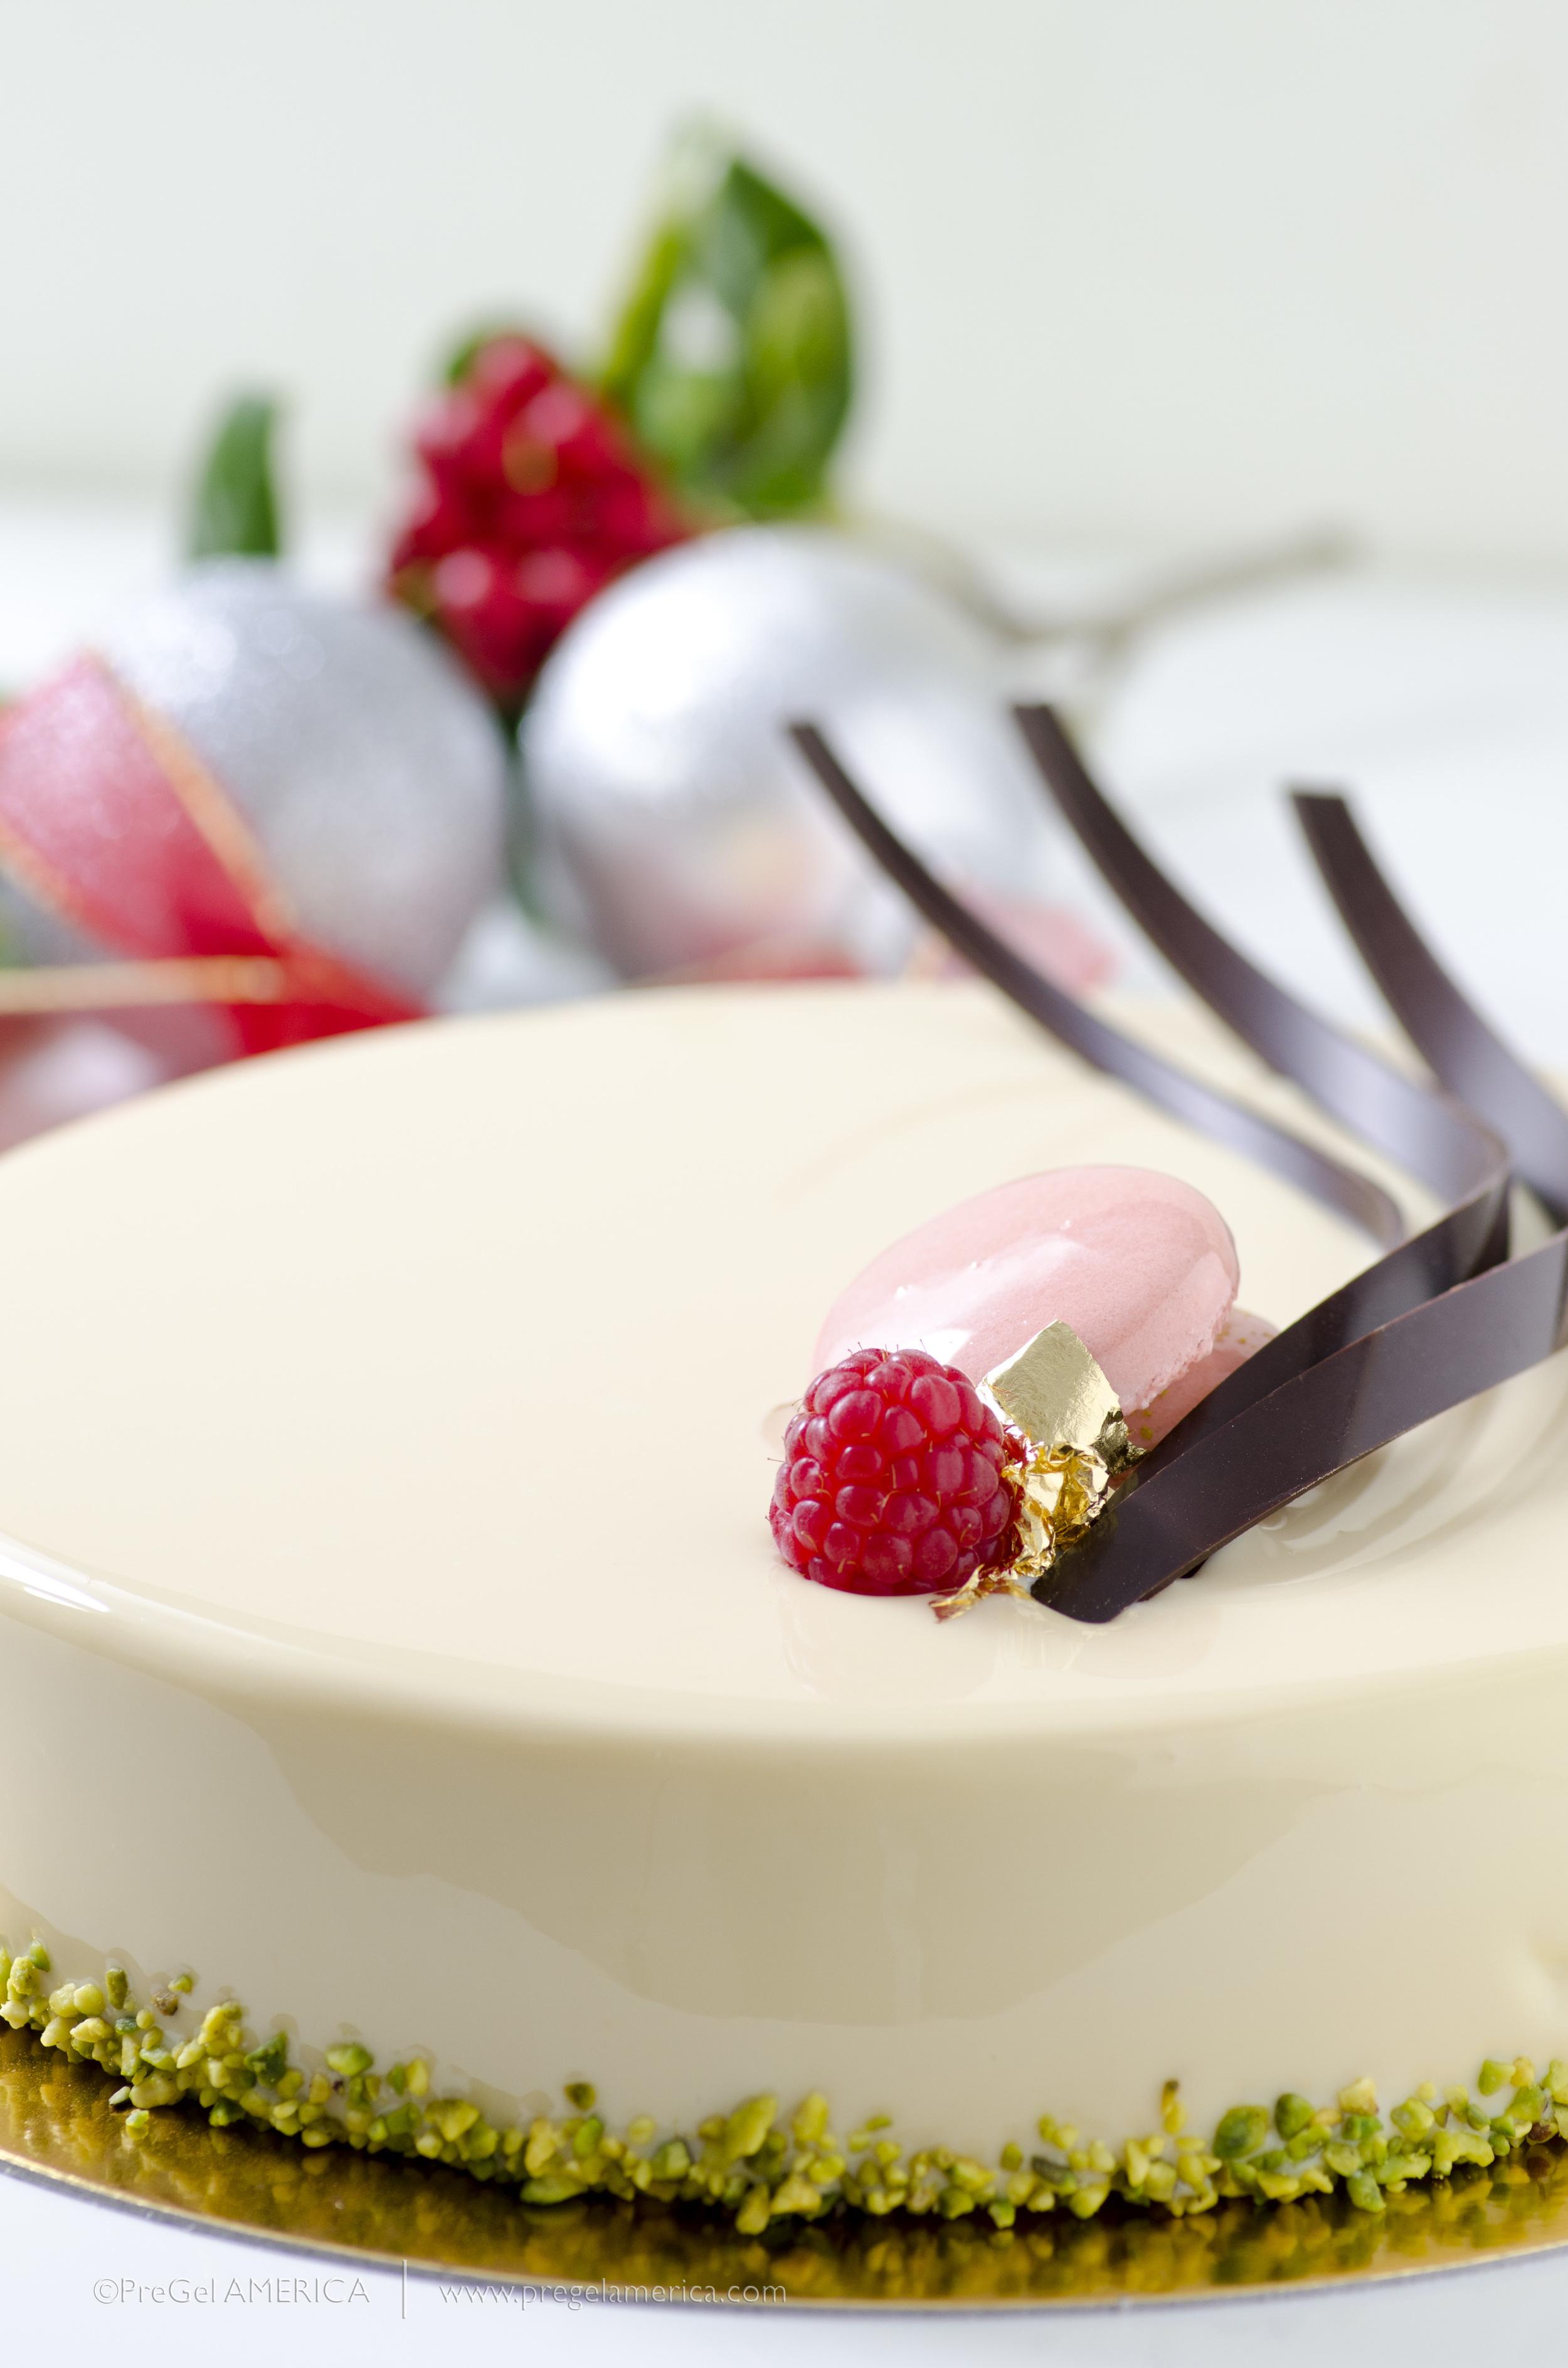 StrawberryPistachioGelatoCakeWM_Pastry.jpg